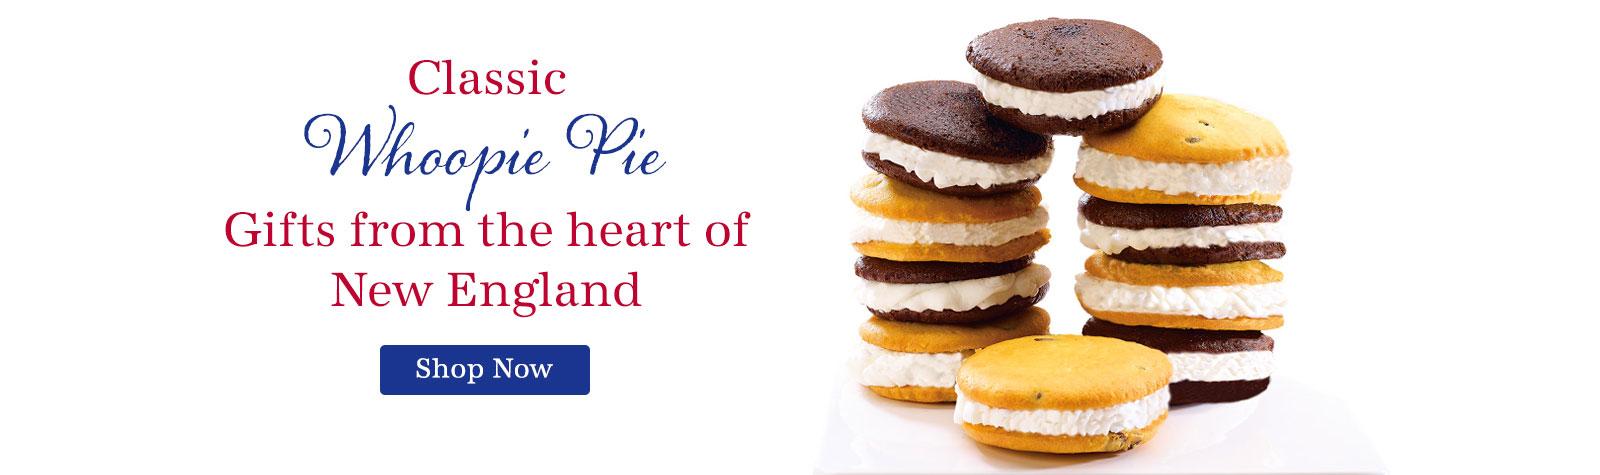 Classic Whoopie Pie